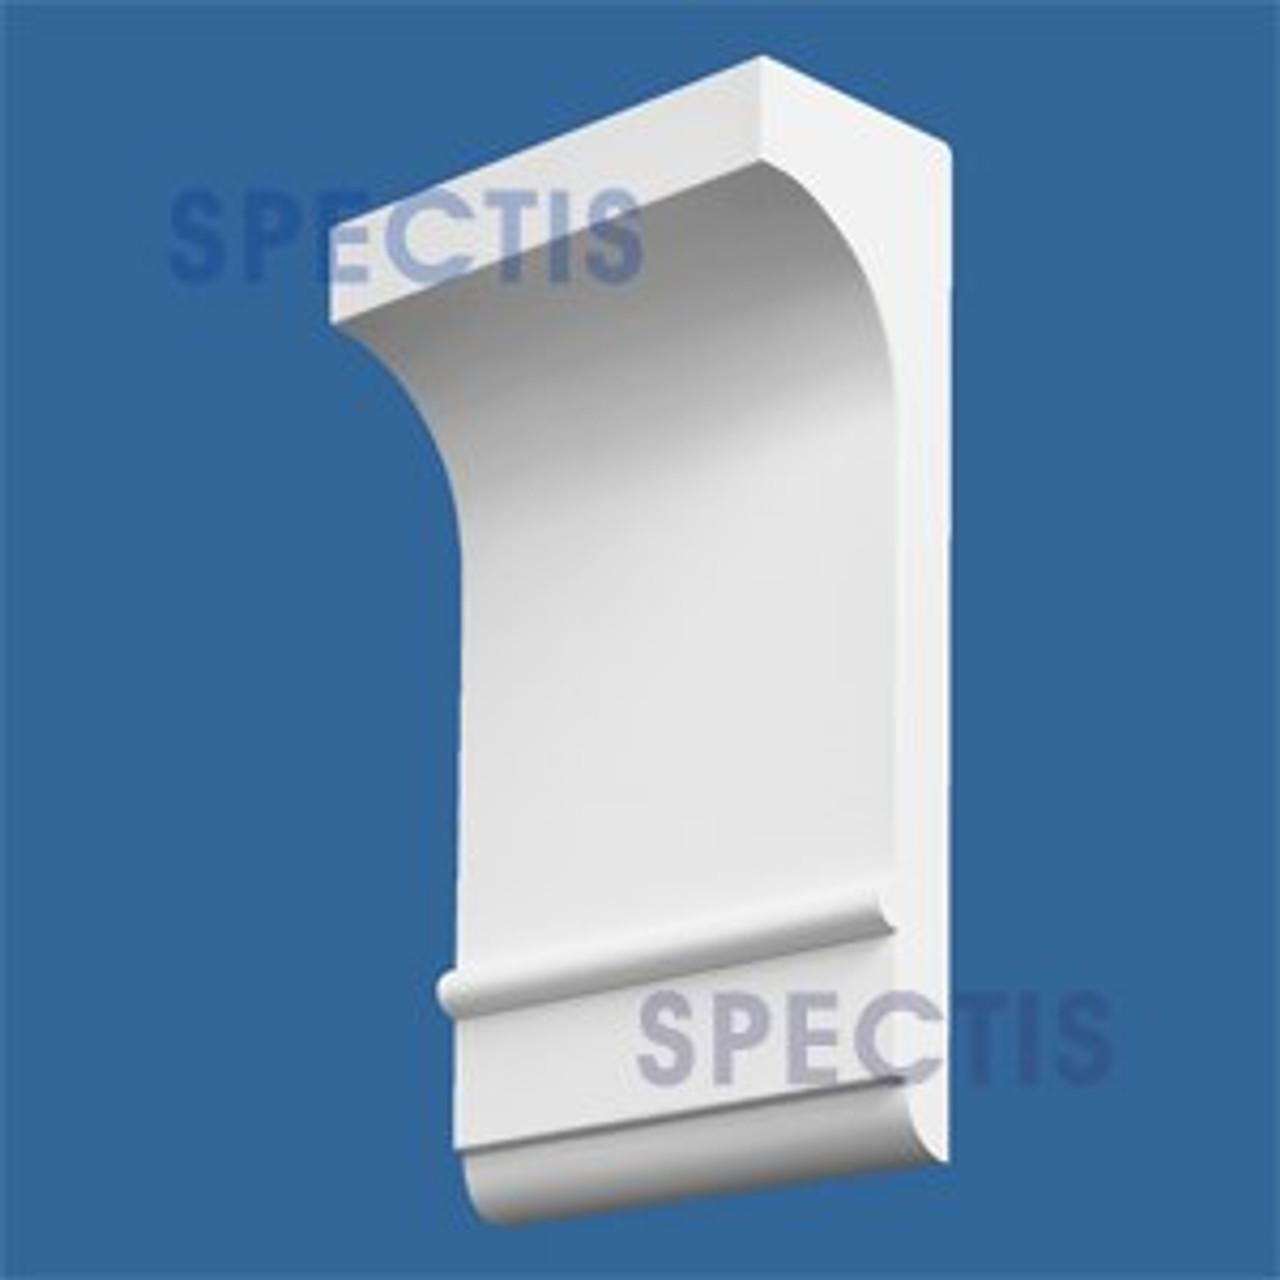 "BL2527 Corbel Block or Eave Bracket 8.12""W x 14.5""H x 4.5"" P"